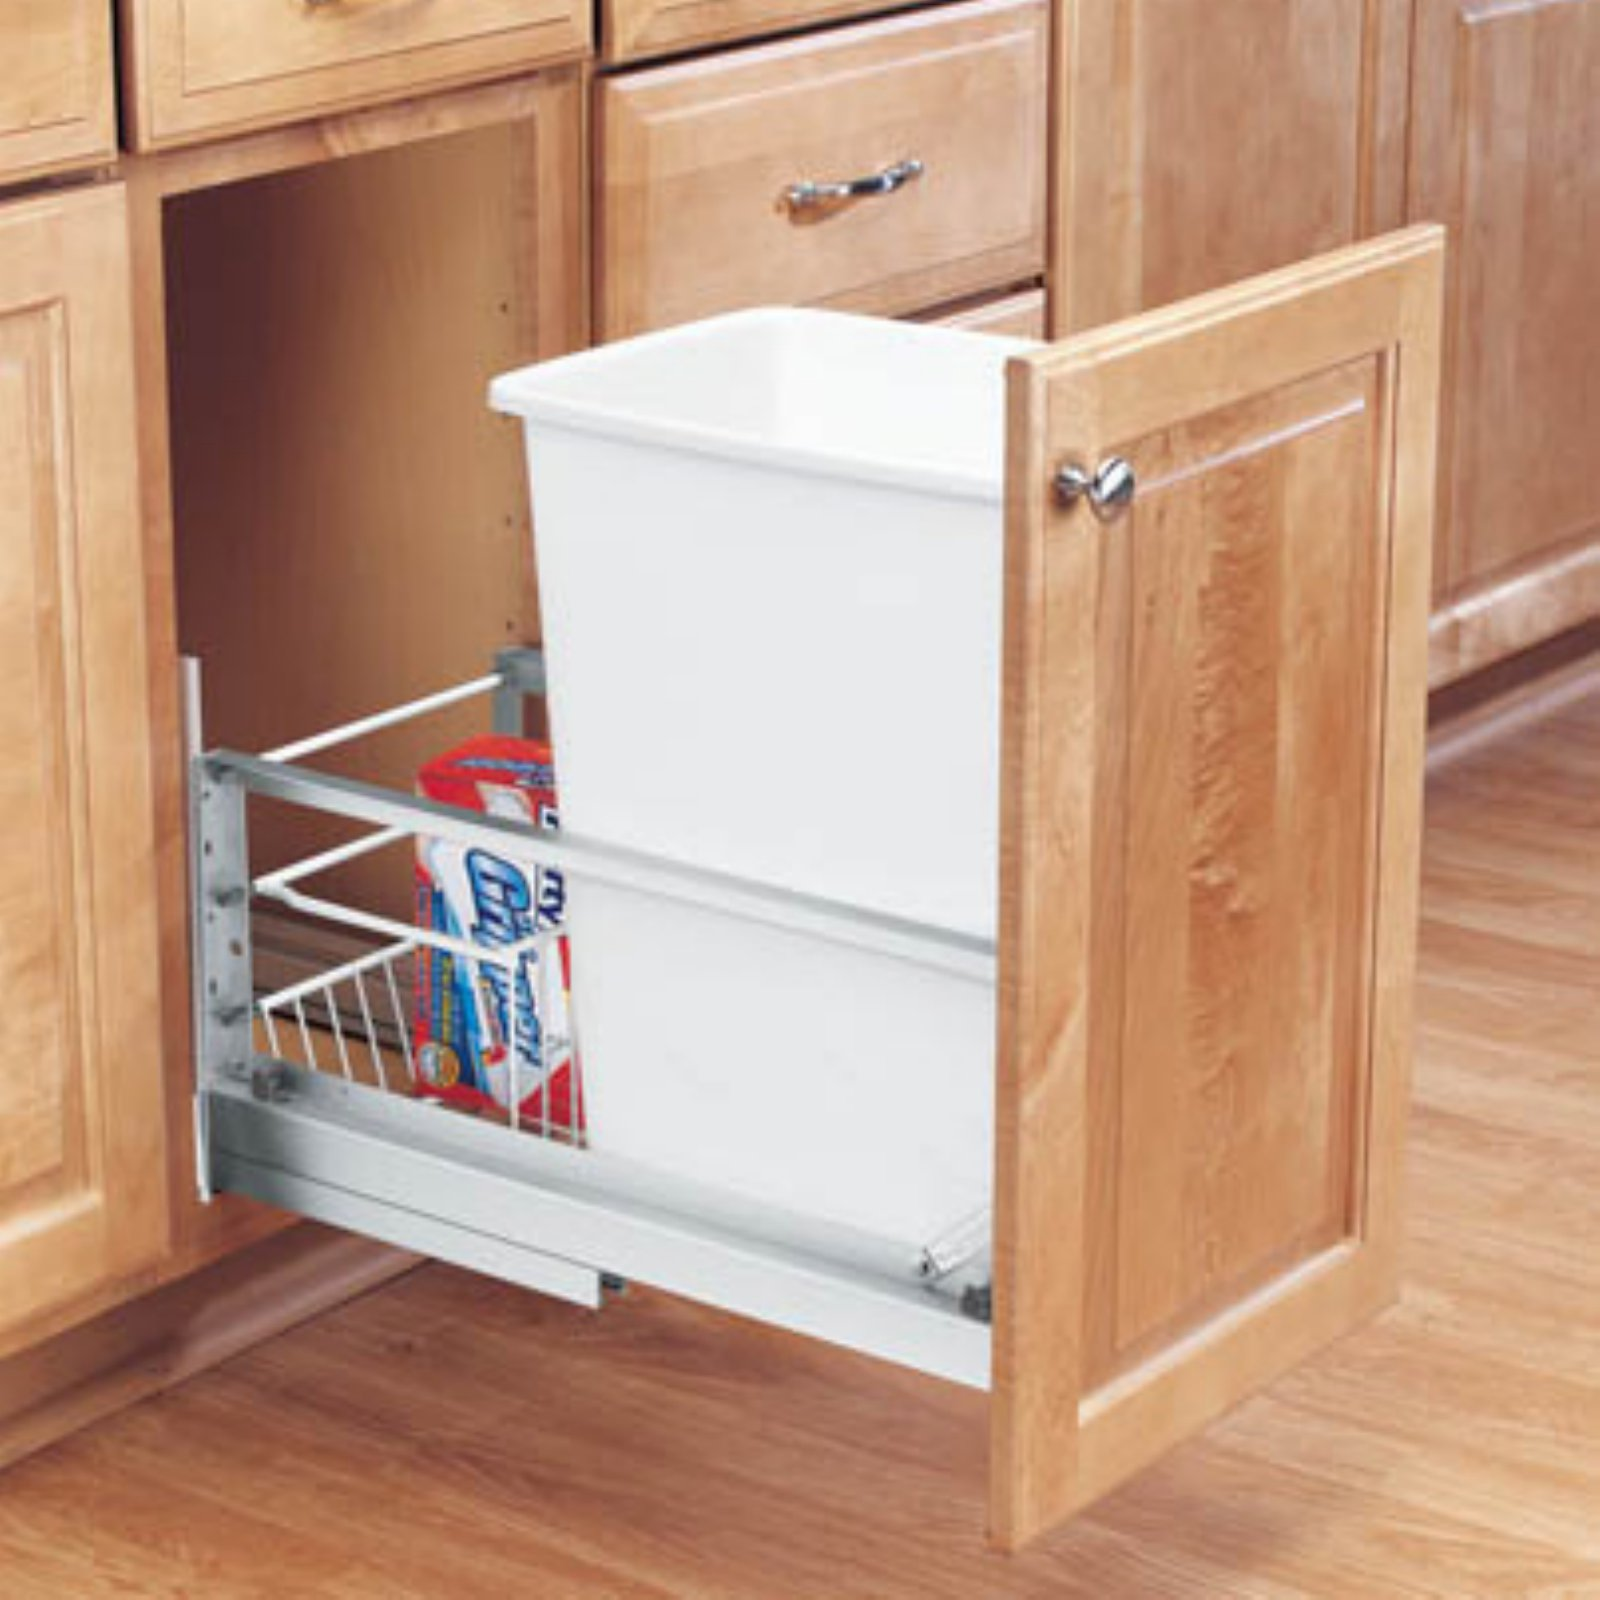 Rev-A-Shelf Soft Close Single Pull Out 35 qt. Trash Can